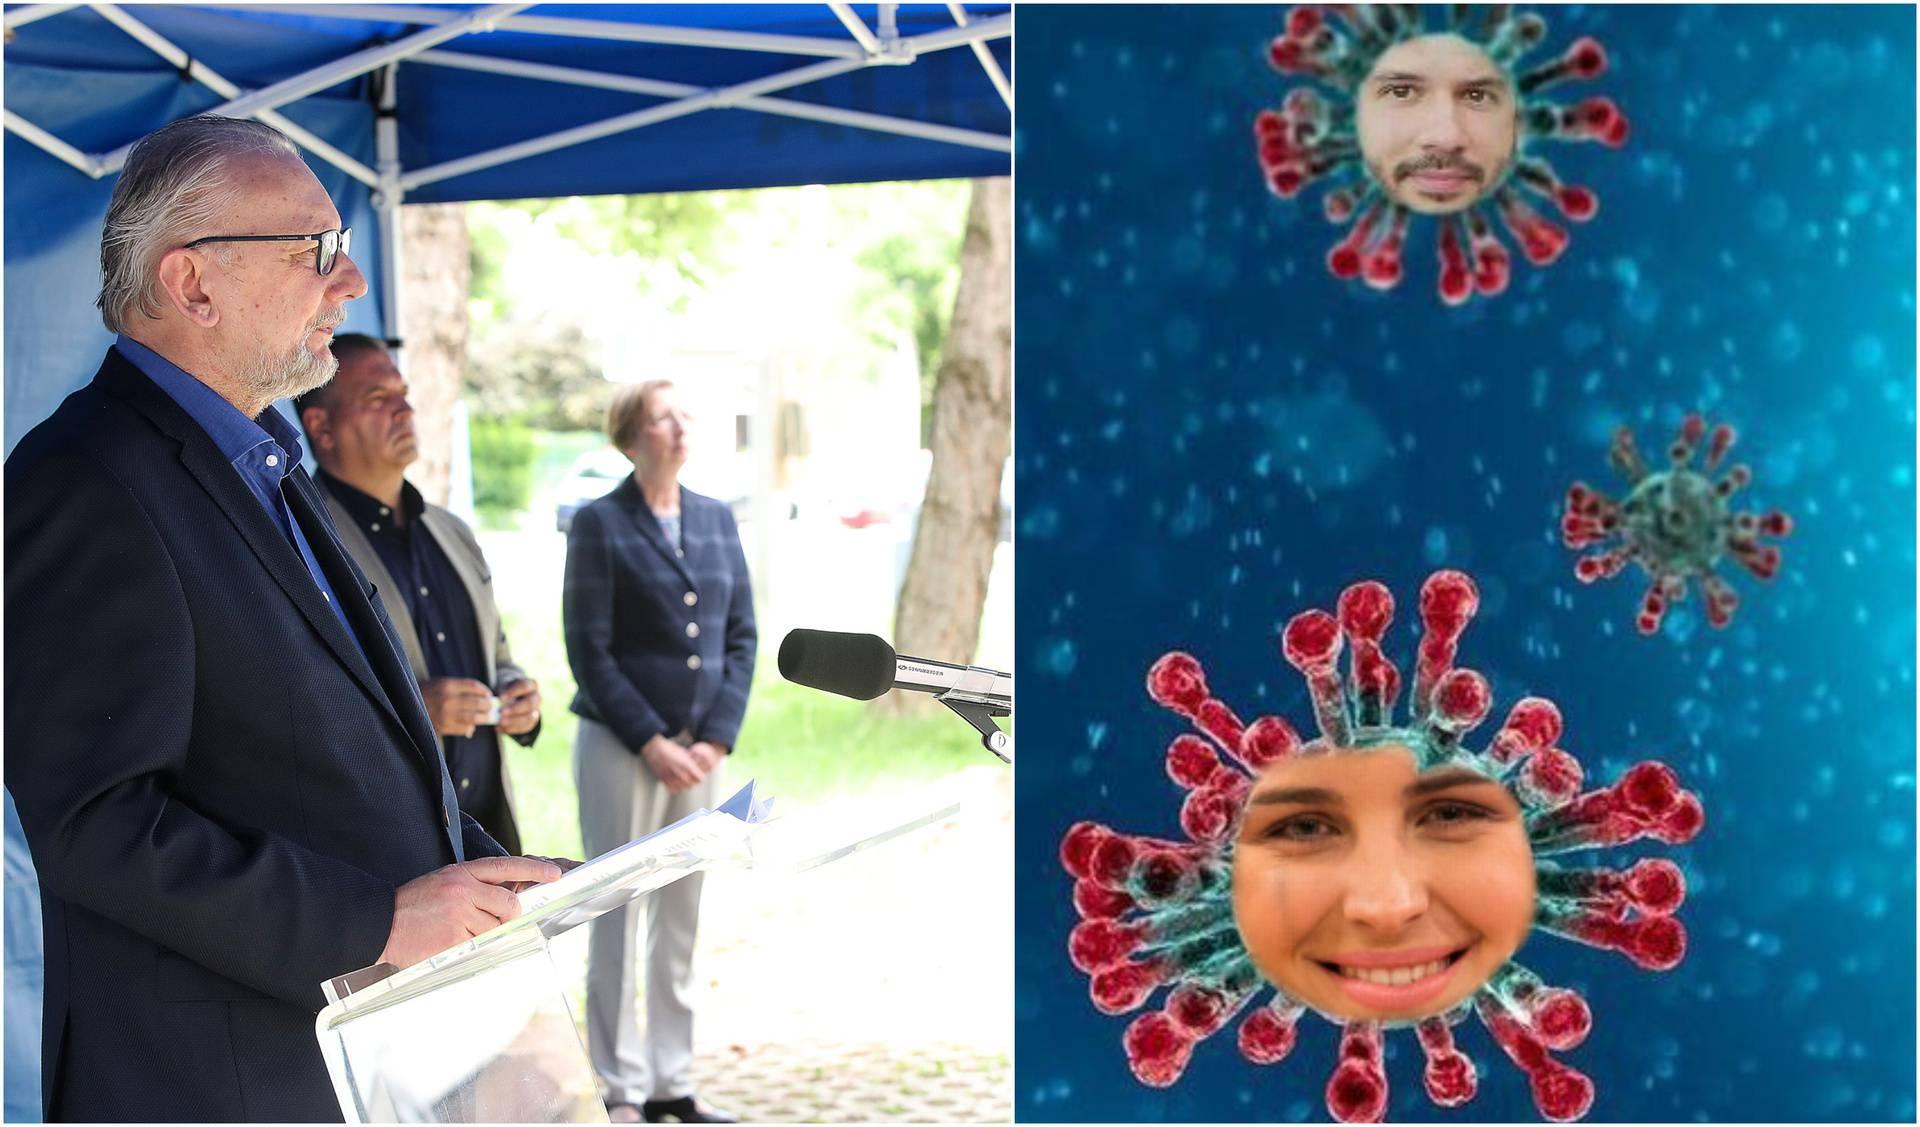 Stožer je objavio nove podatke: Danas troje novouplakanih zbog razvoda Doris Pinčić Rogoznice!